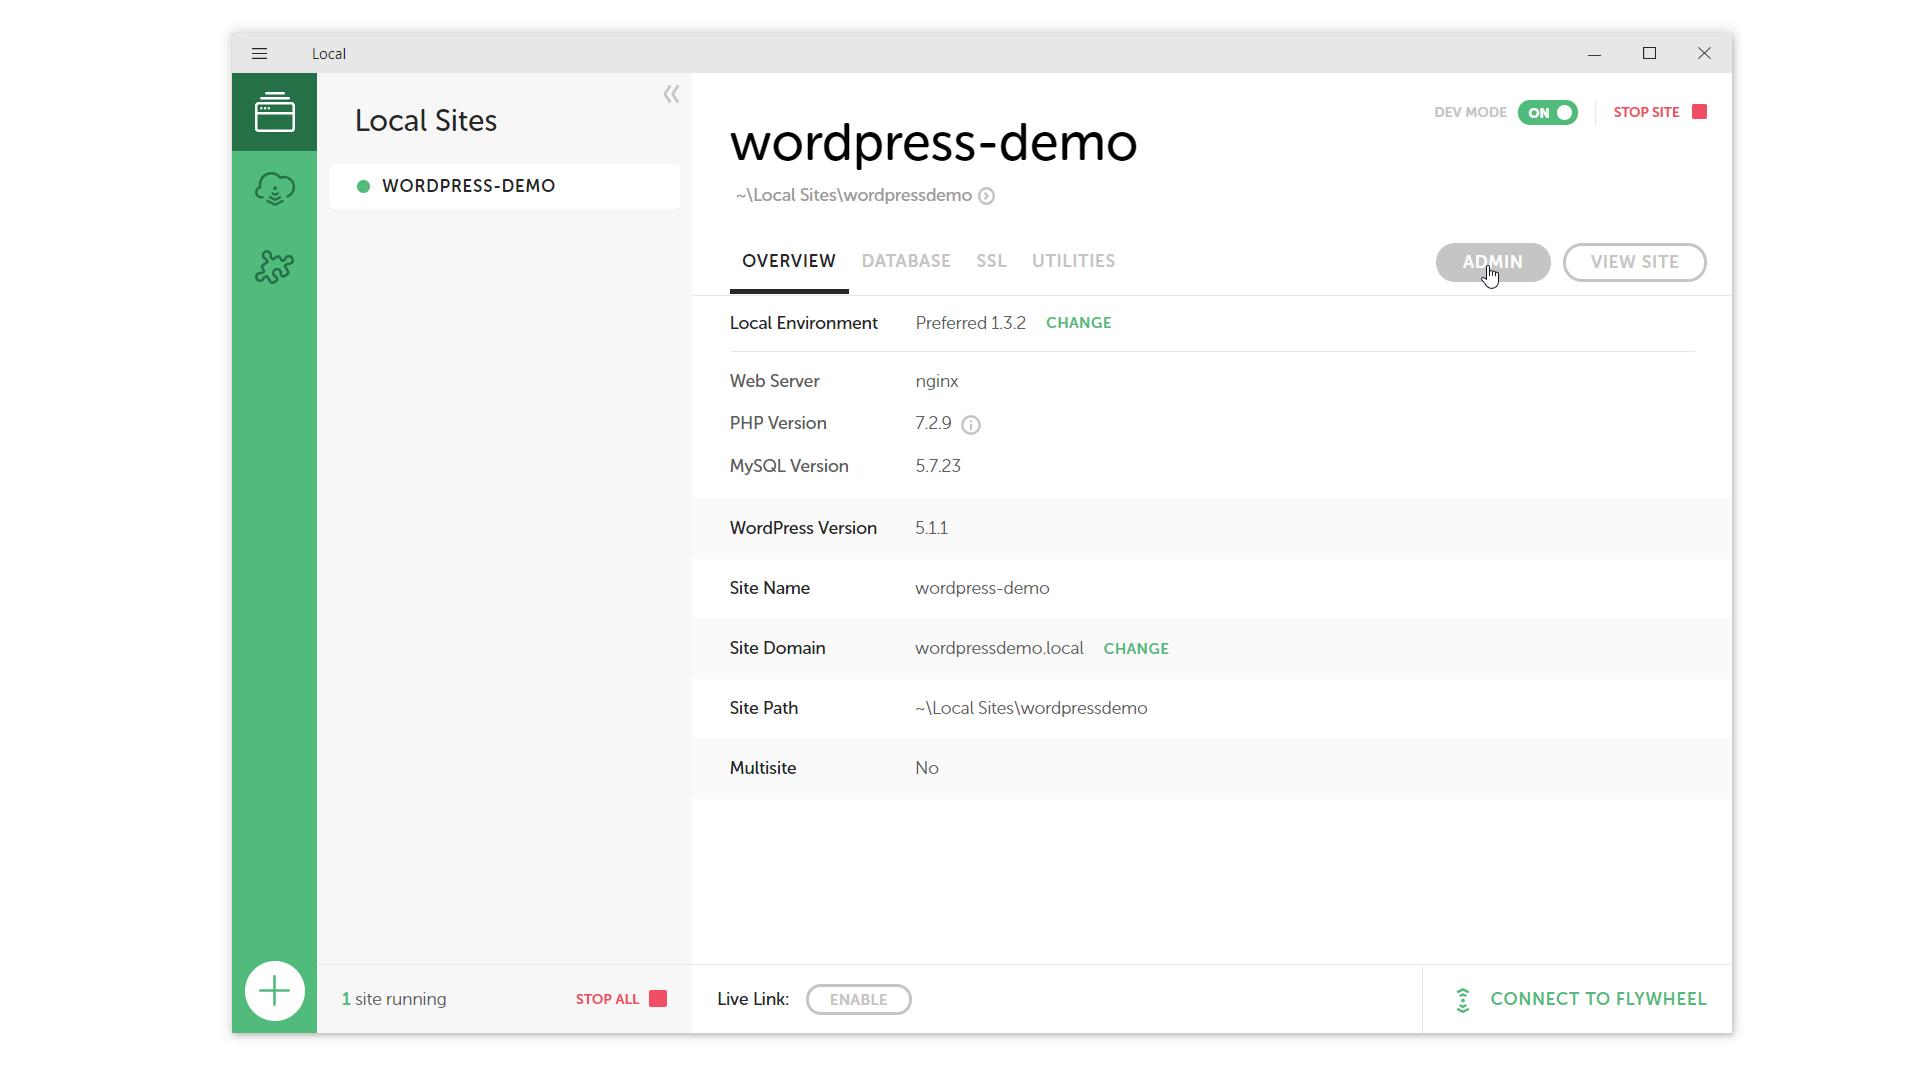 WordPressのテスト環境が作れる Local by Flywheelを紹介します